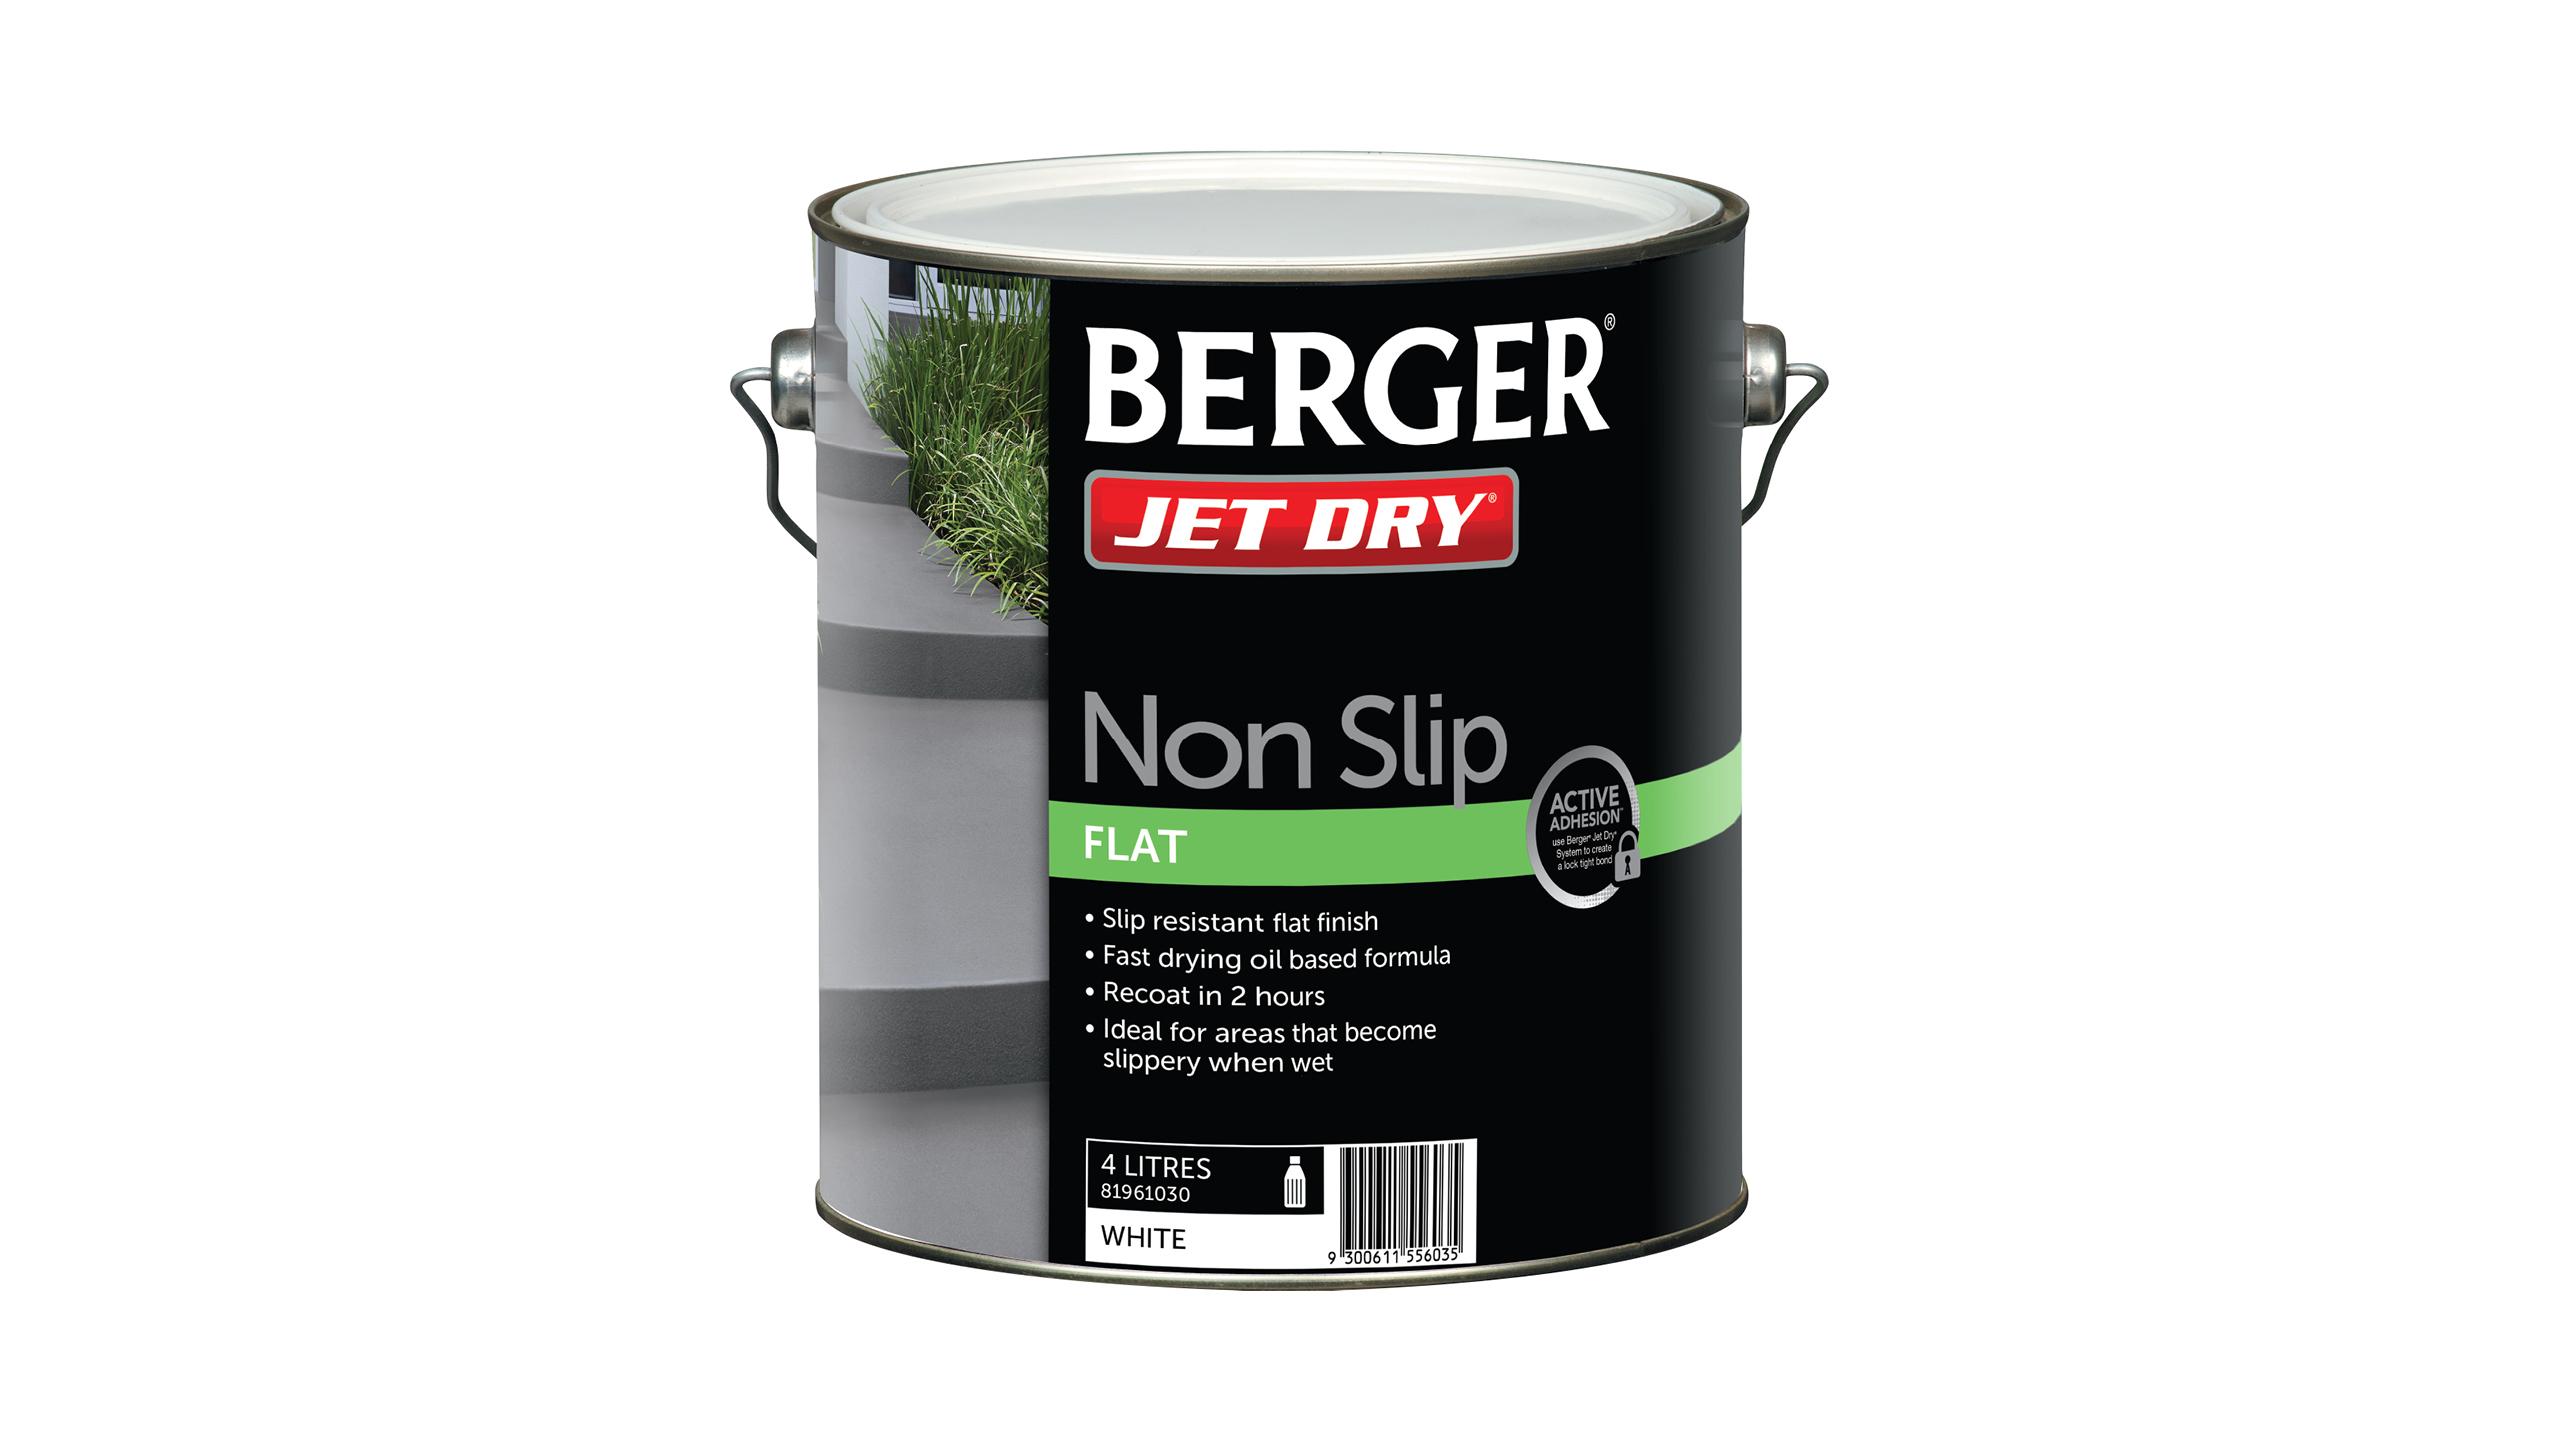 berger jet dry instructions